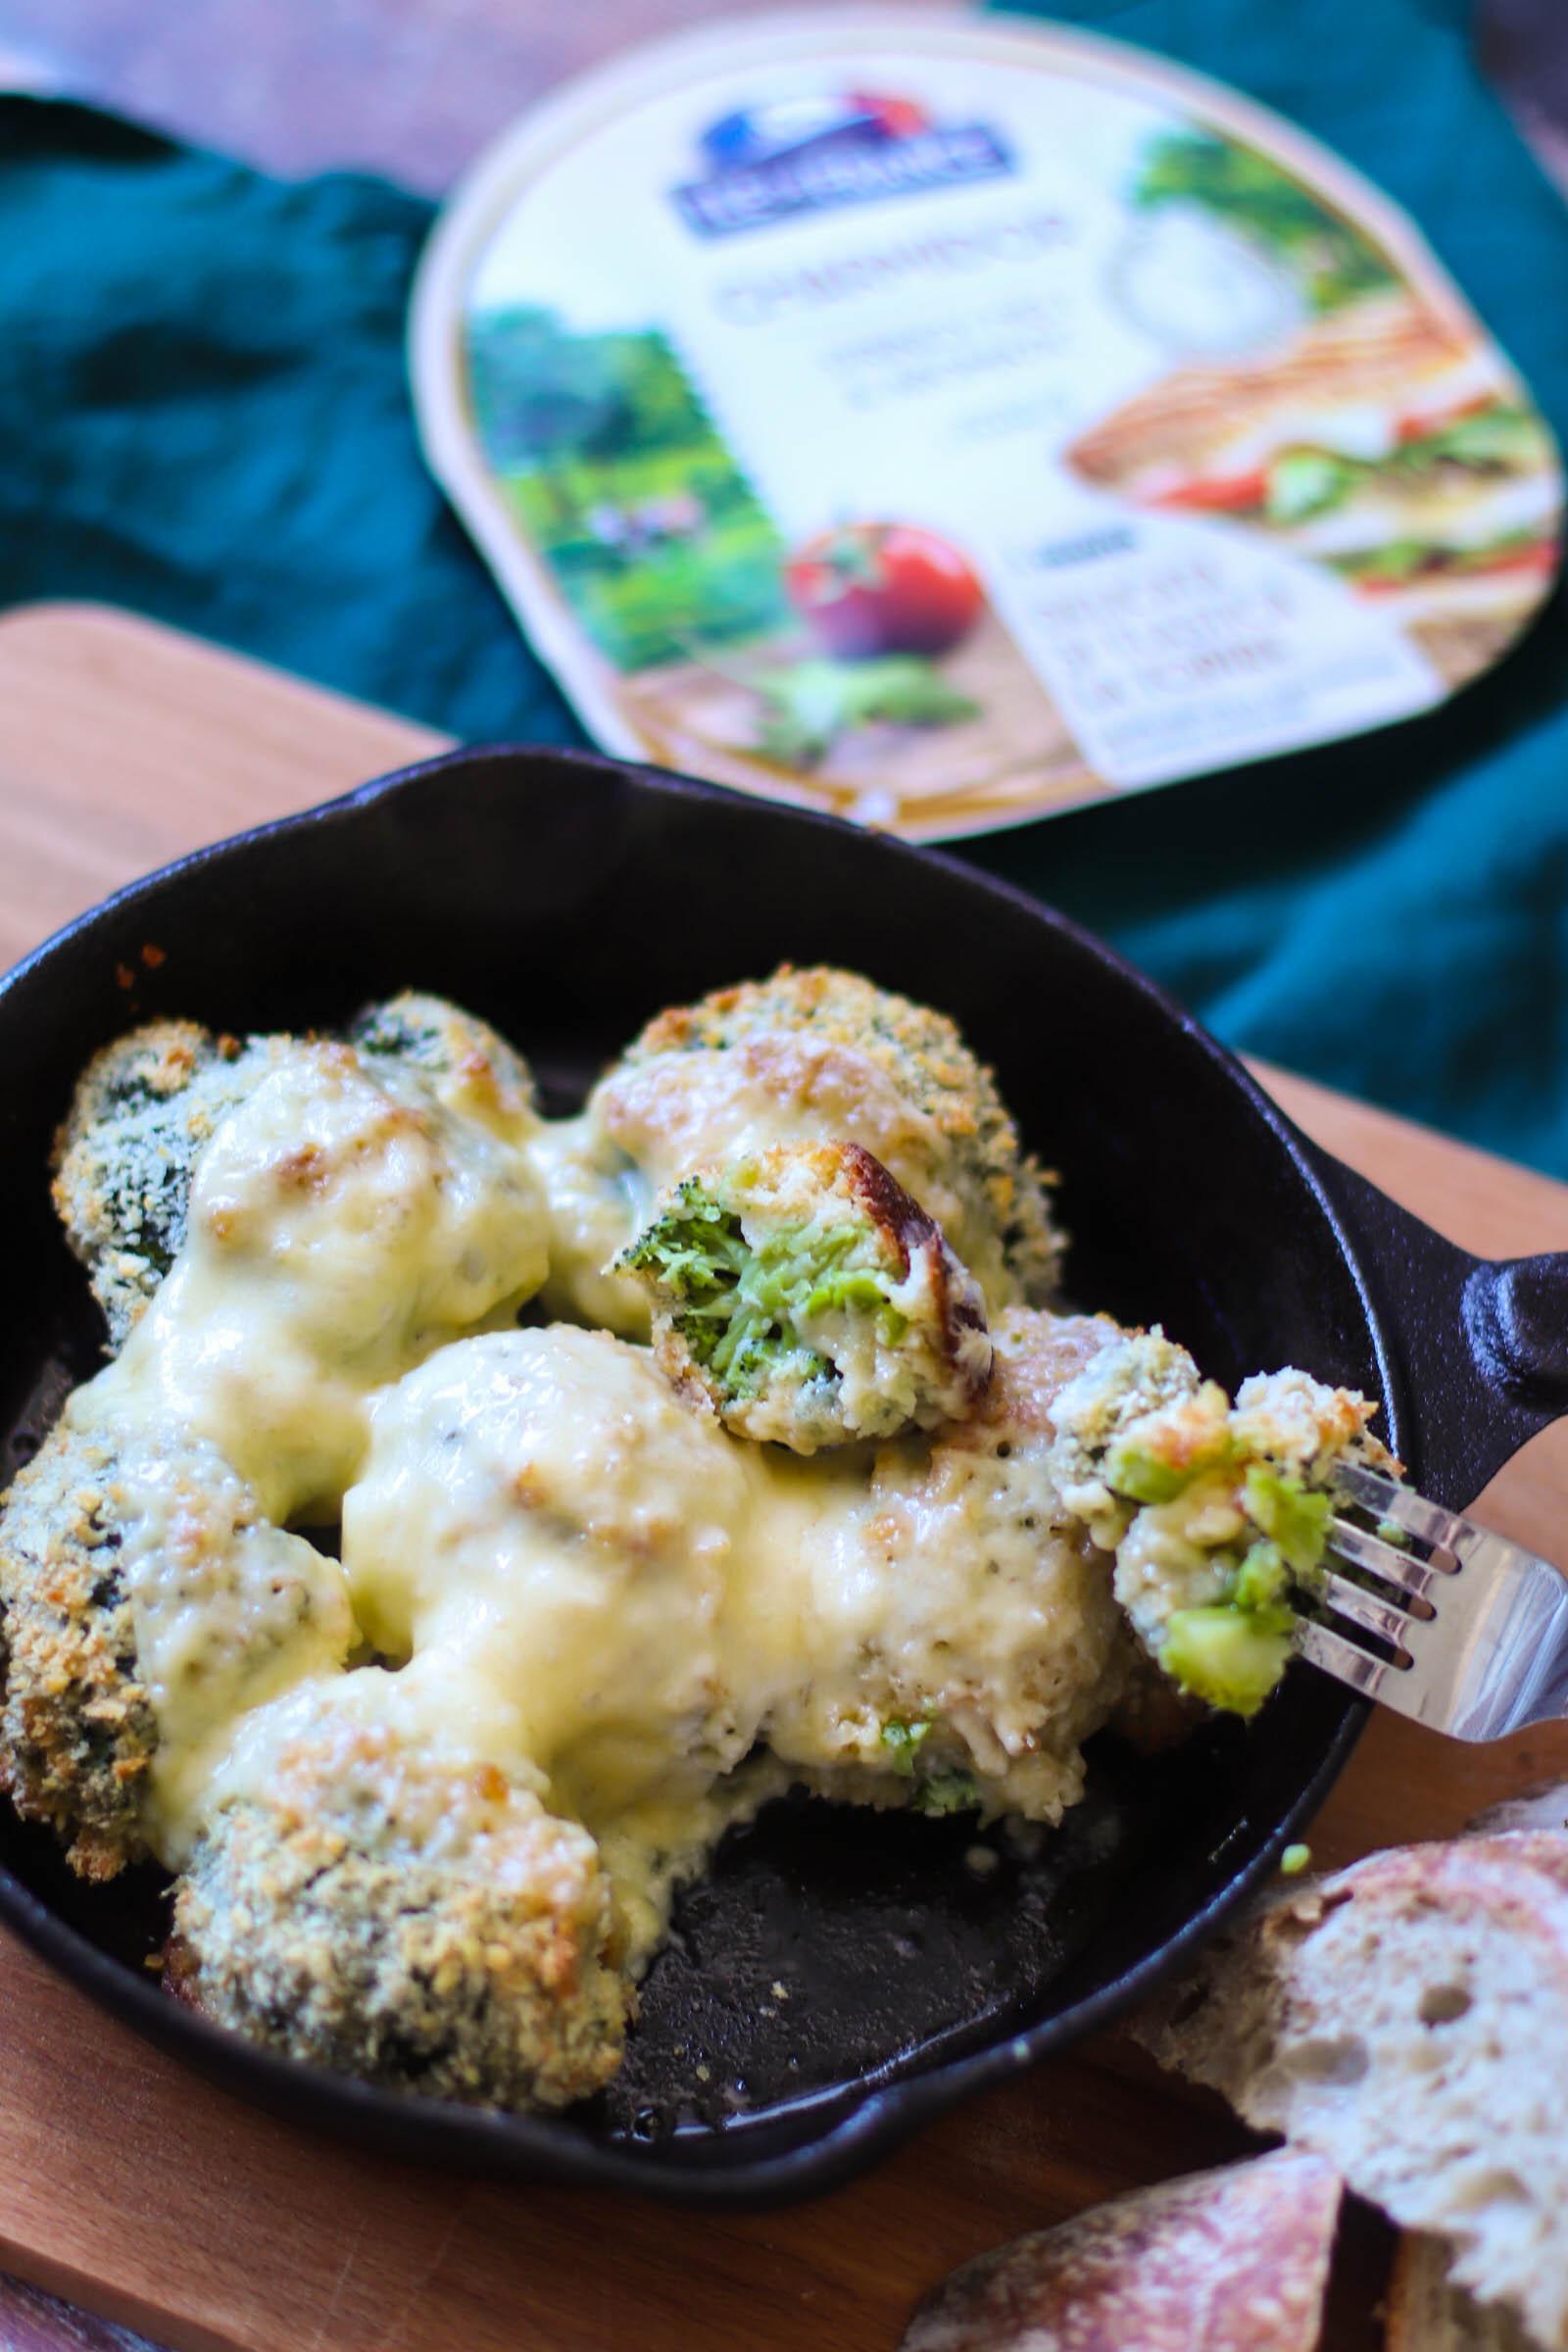 Broccoli crocant la cuptor